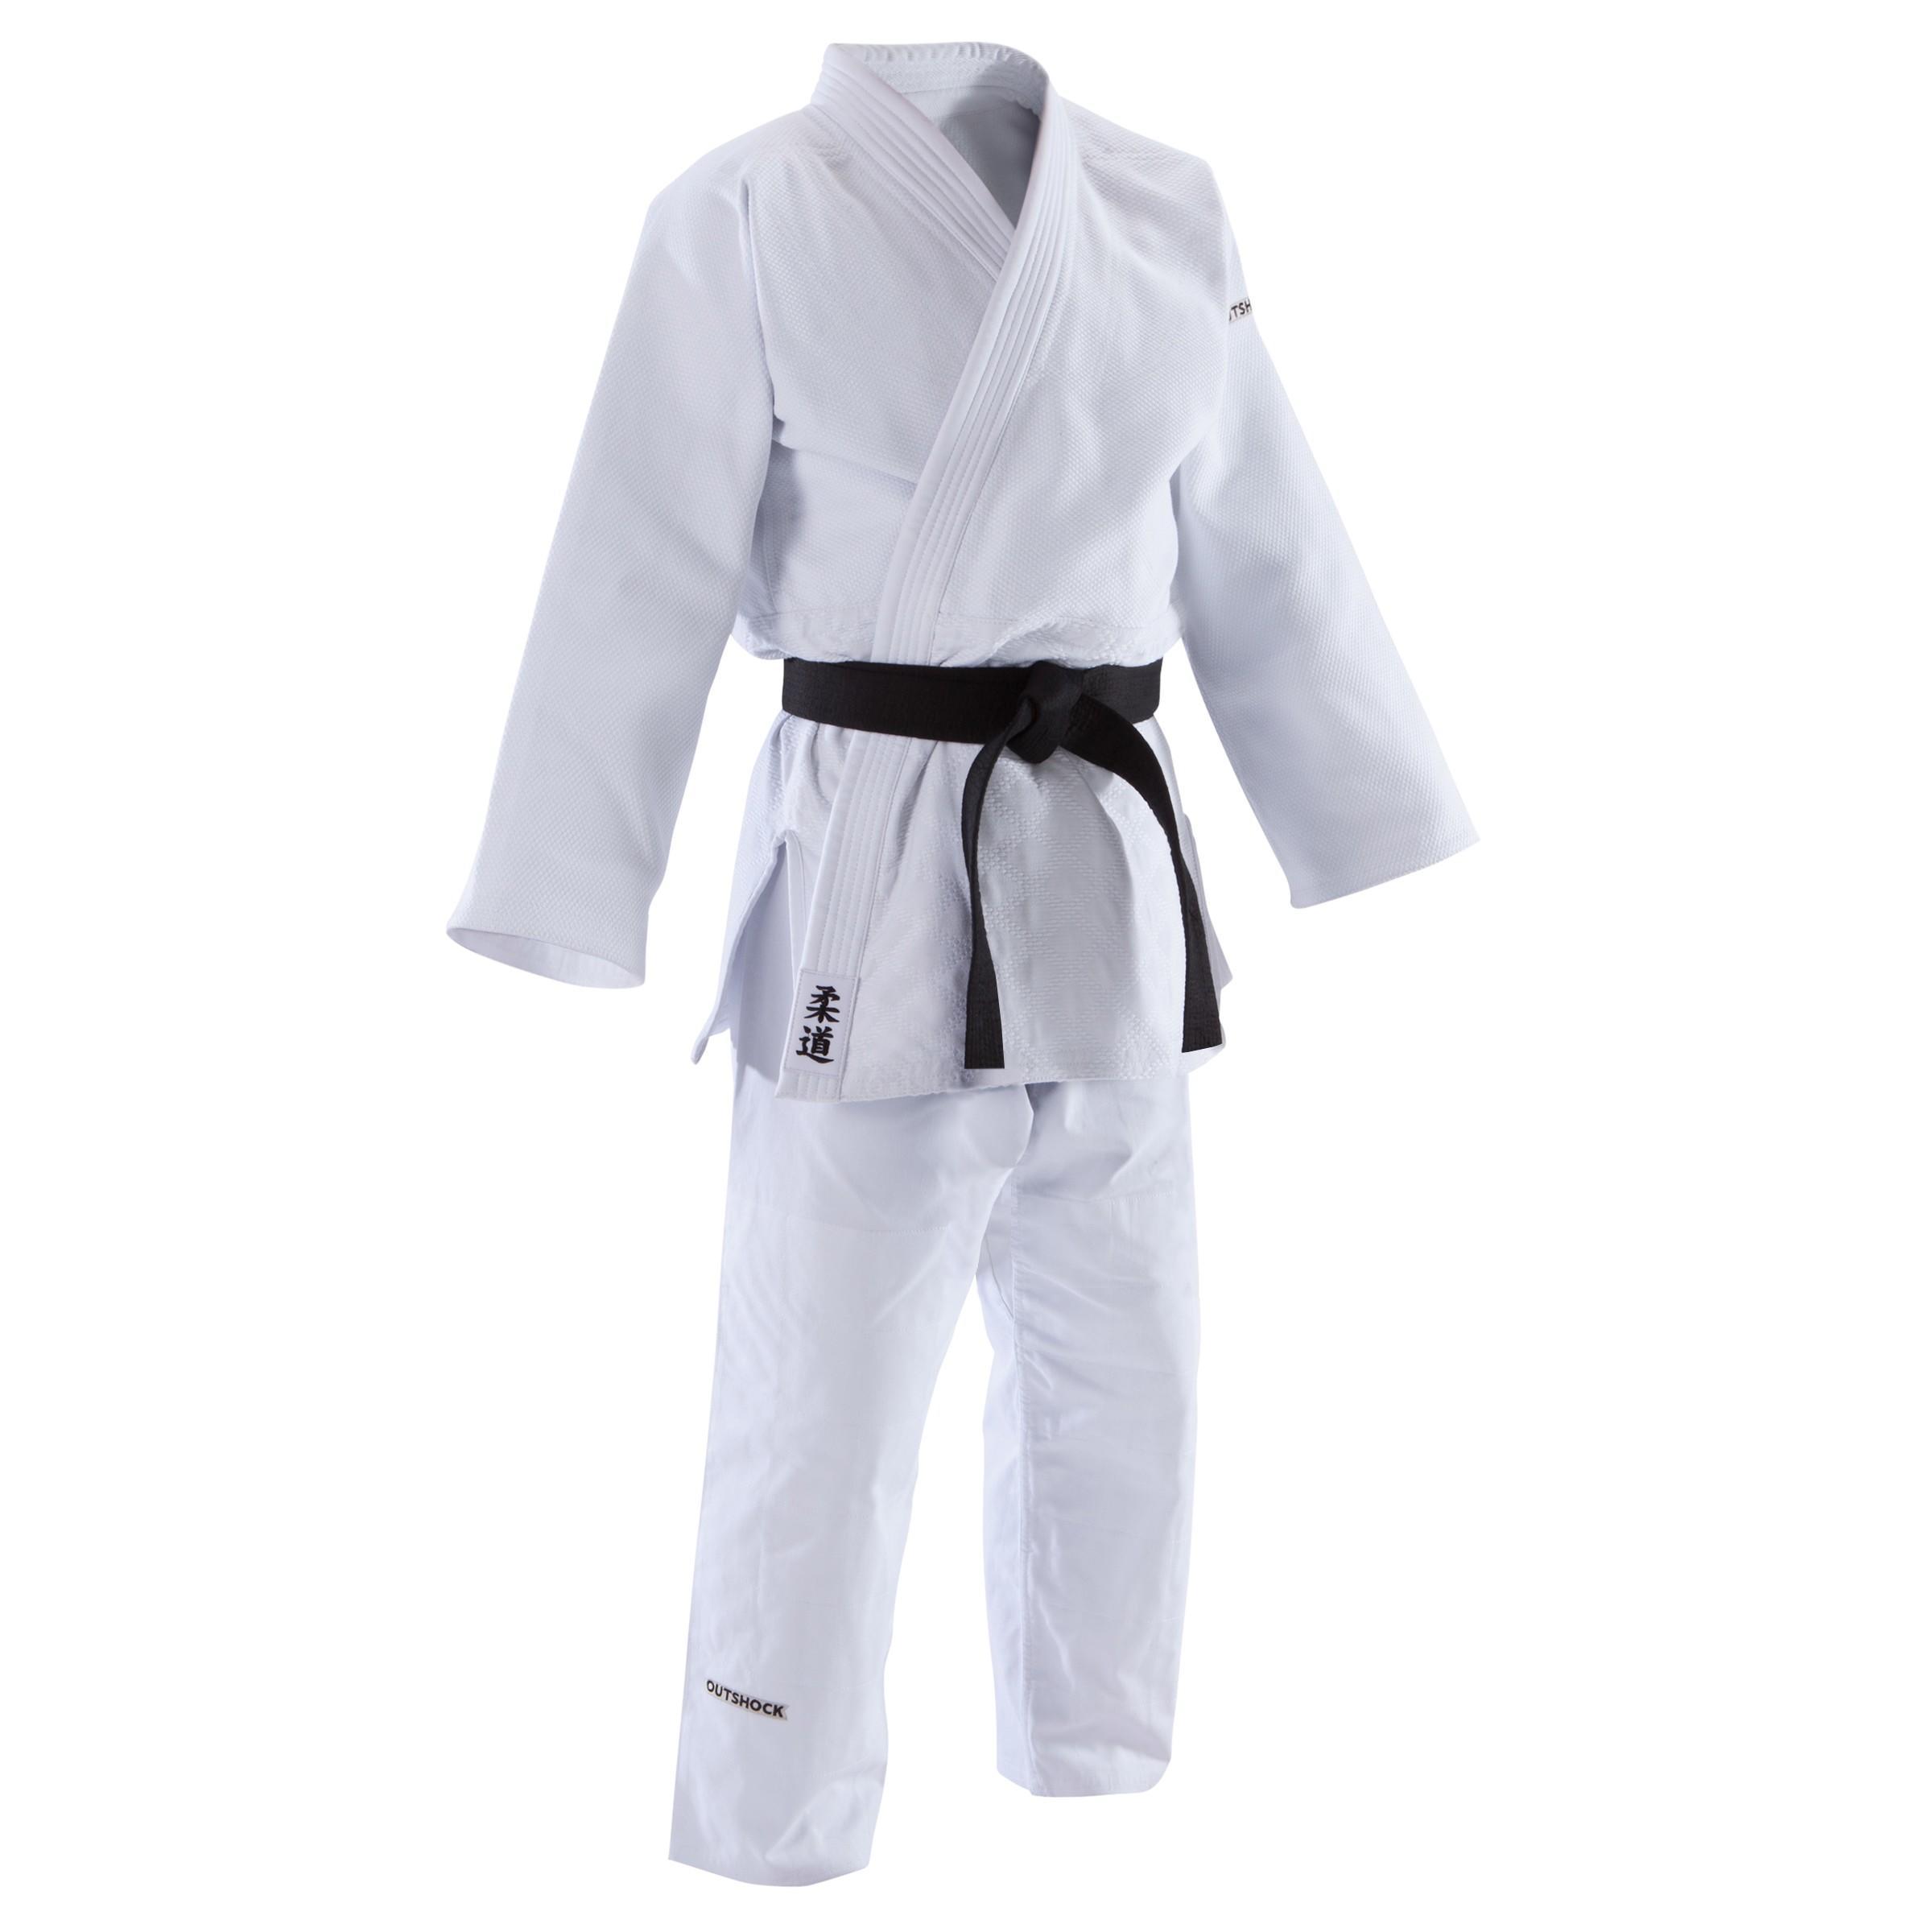 Outshock Judopak 900 volwassenen wit